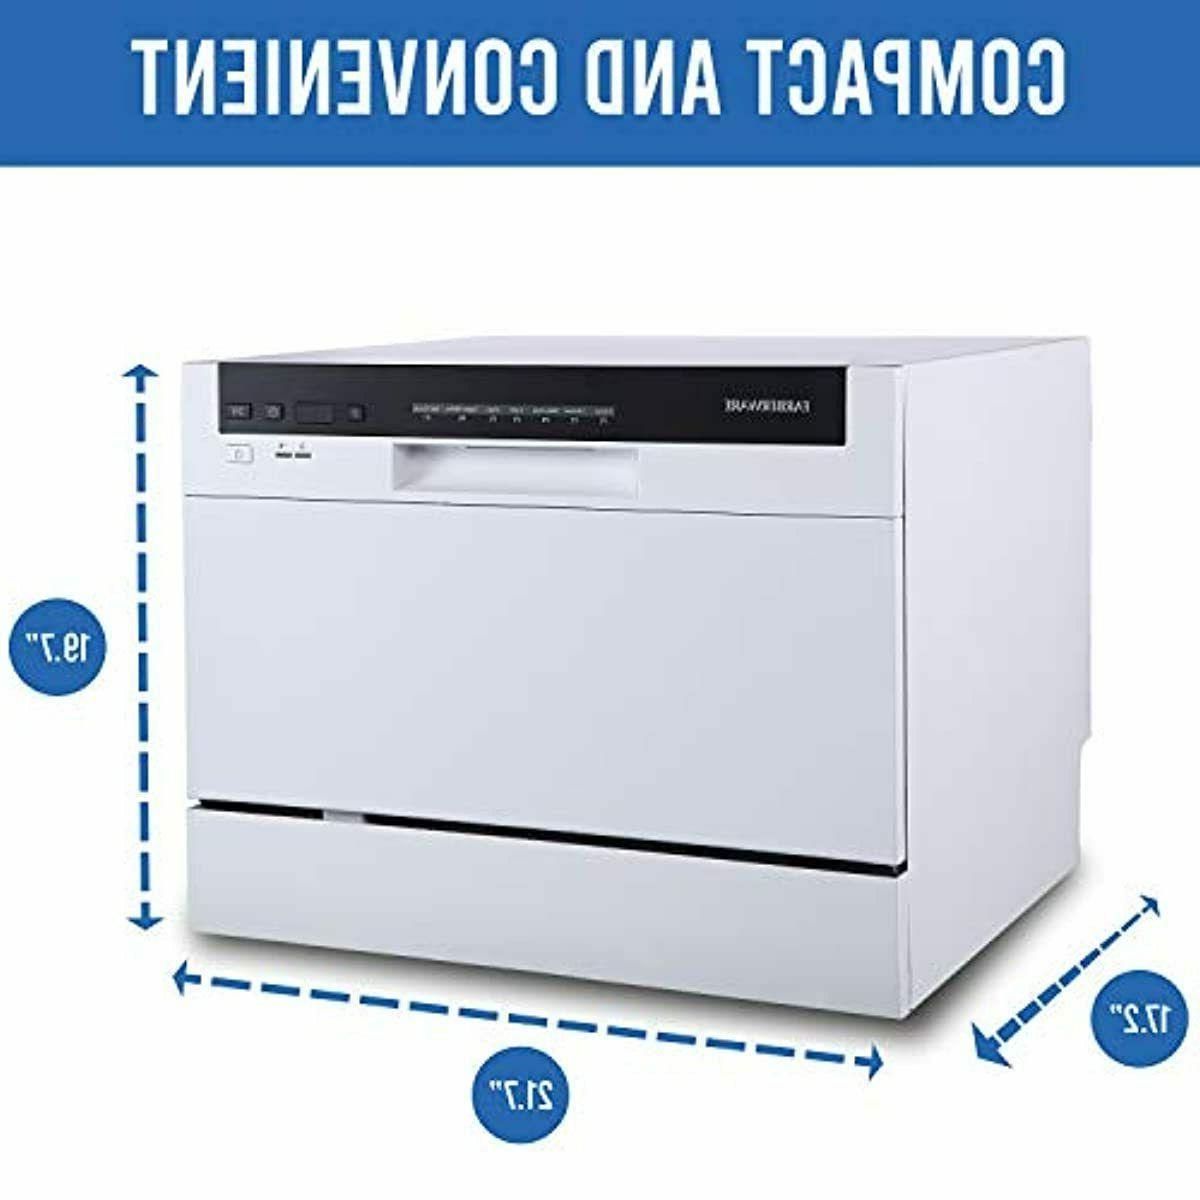 Professional Portable Dishwasher